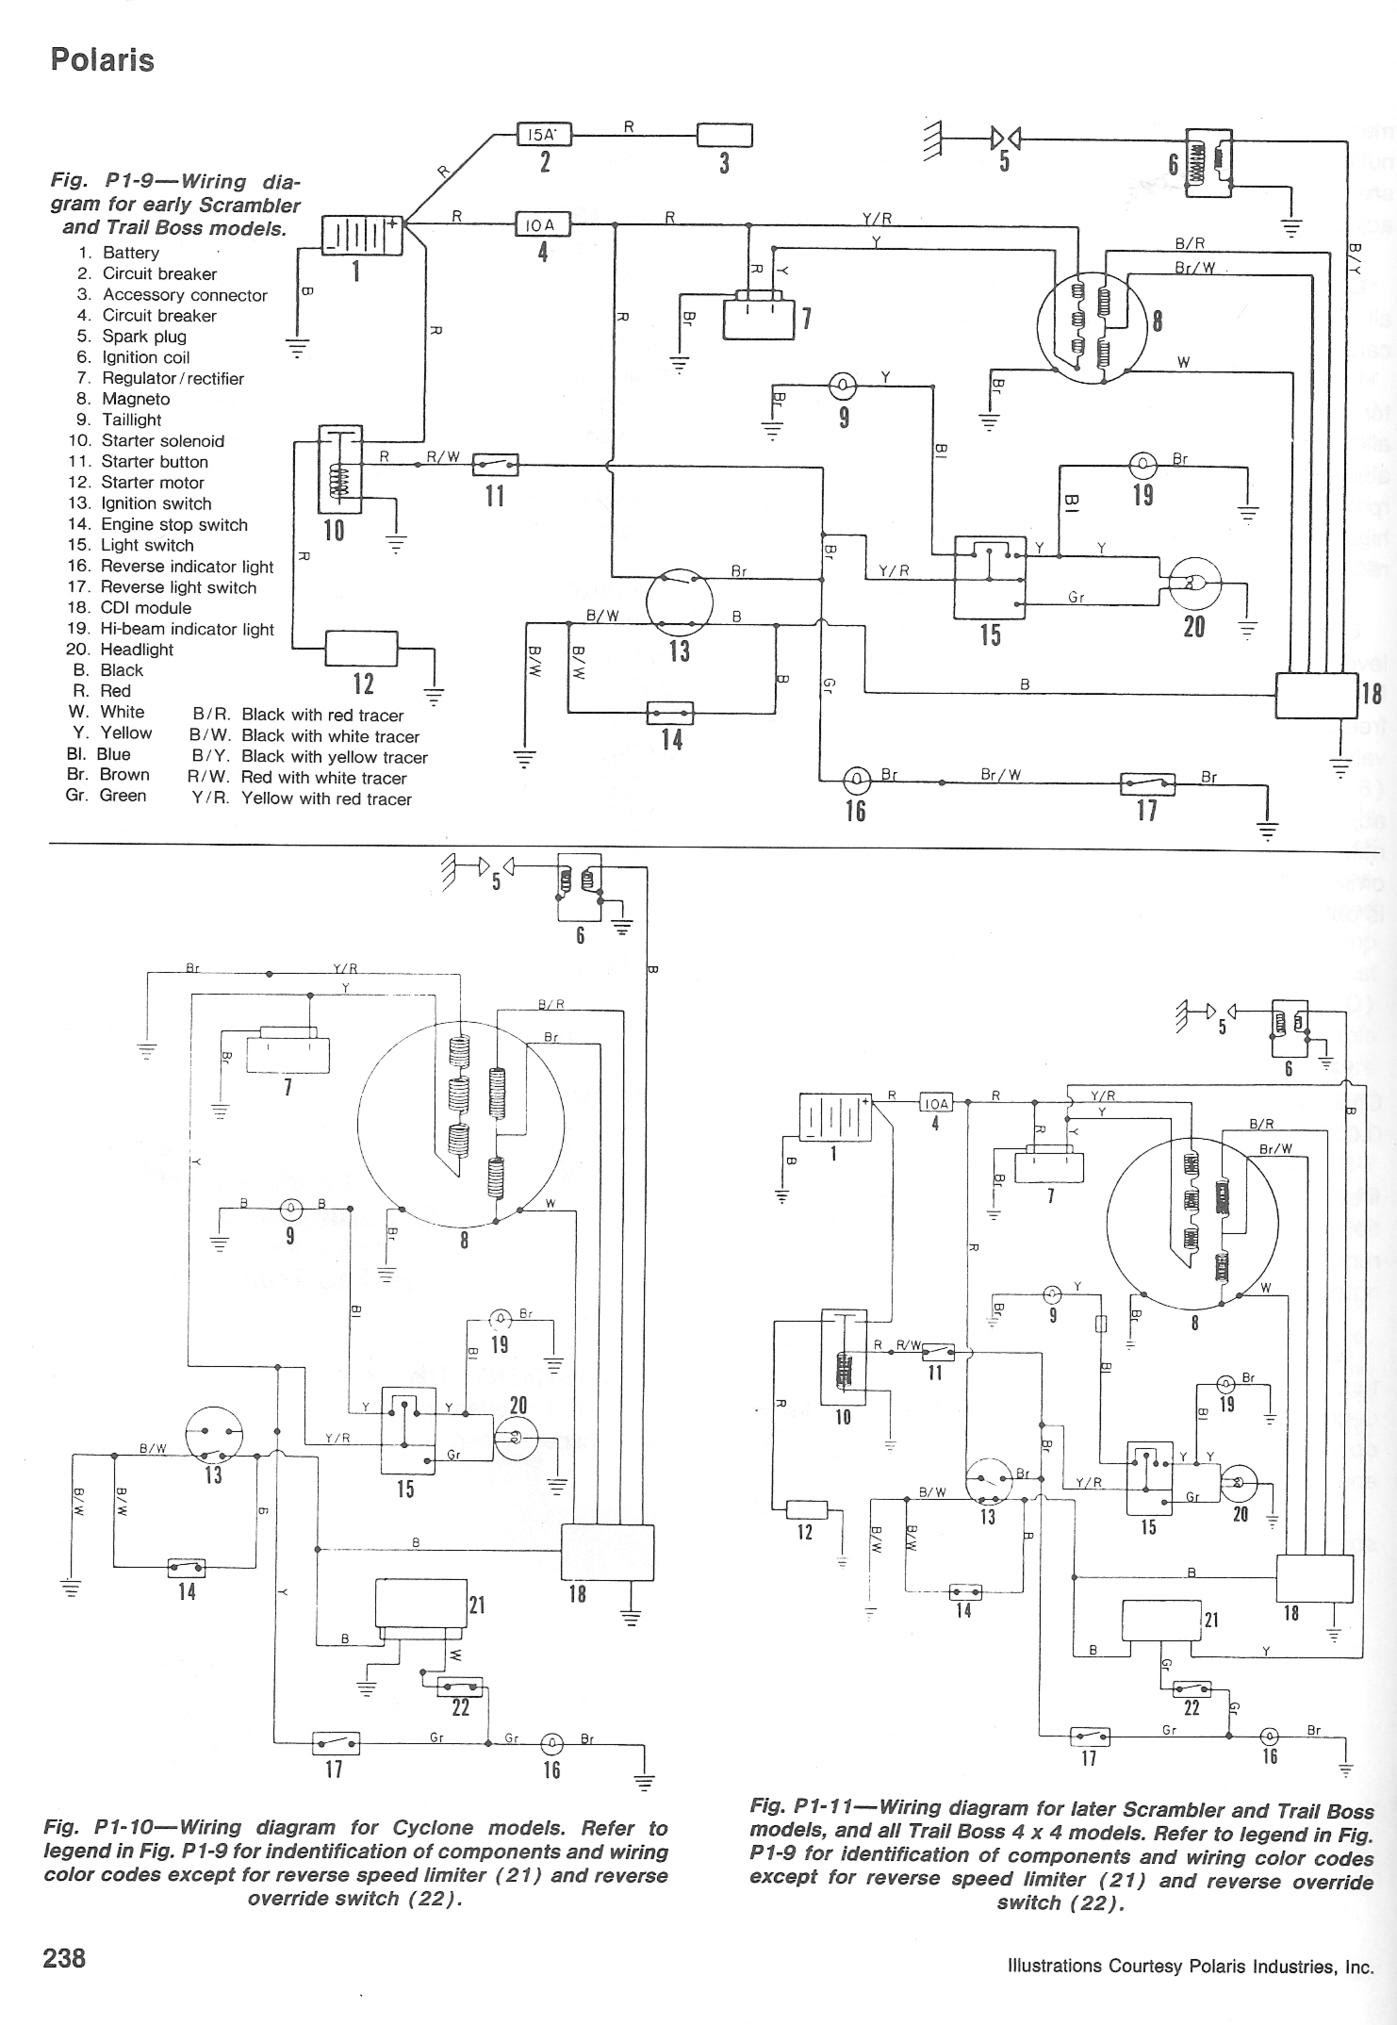 Diagram 2005 Polaris Phoenix Wiring Diagram Full Version Hd Quality Wiring Diagram Bpmdiagrams Biorygen It